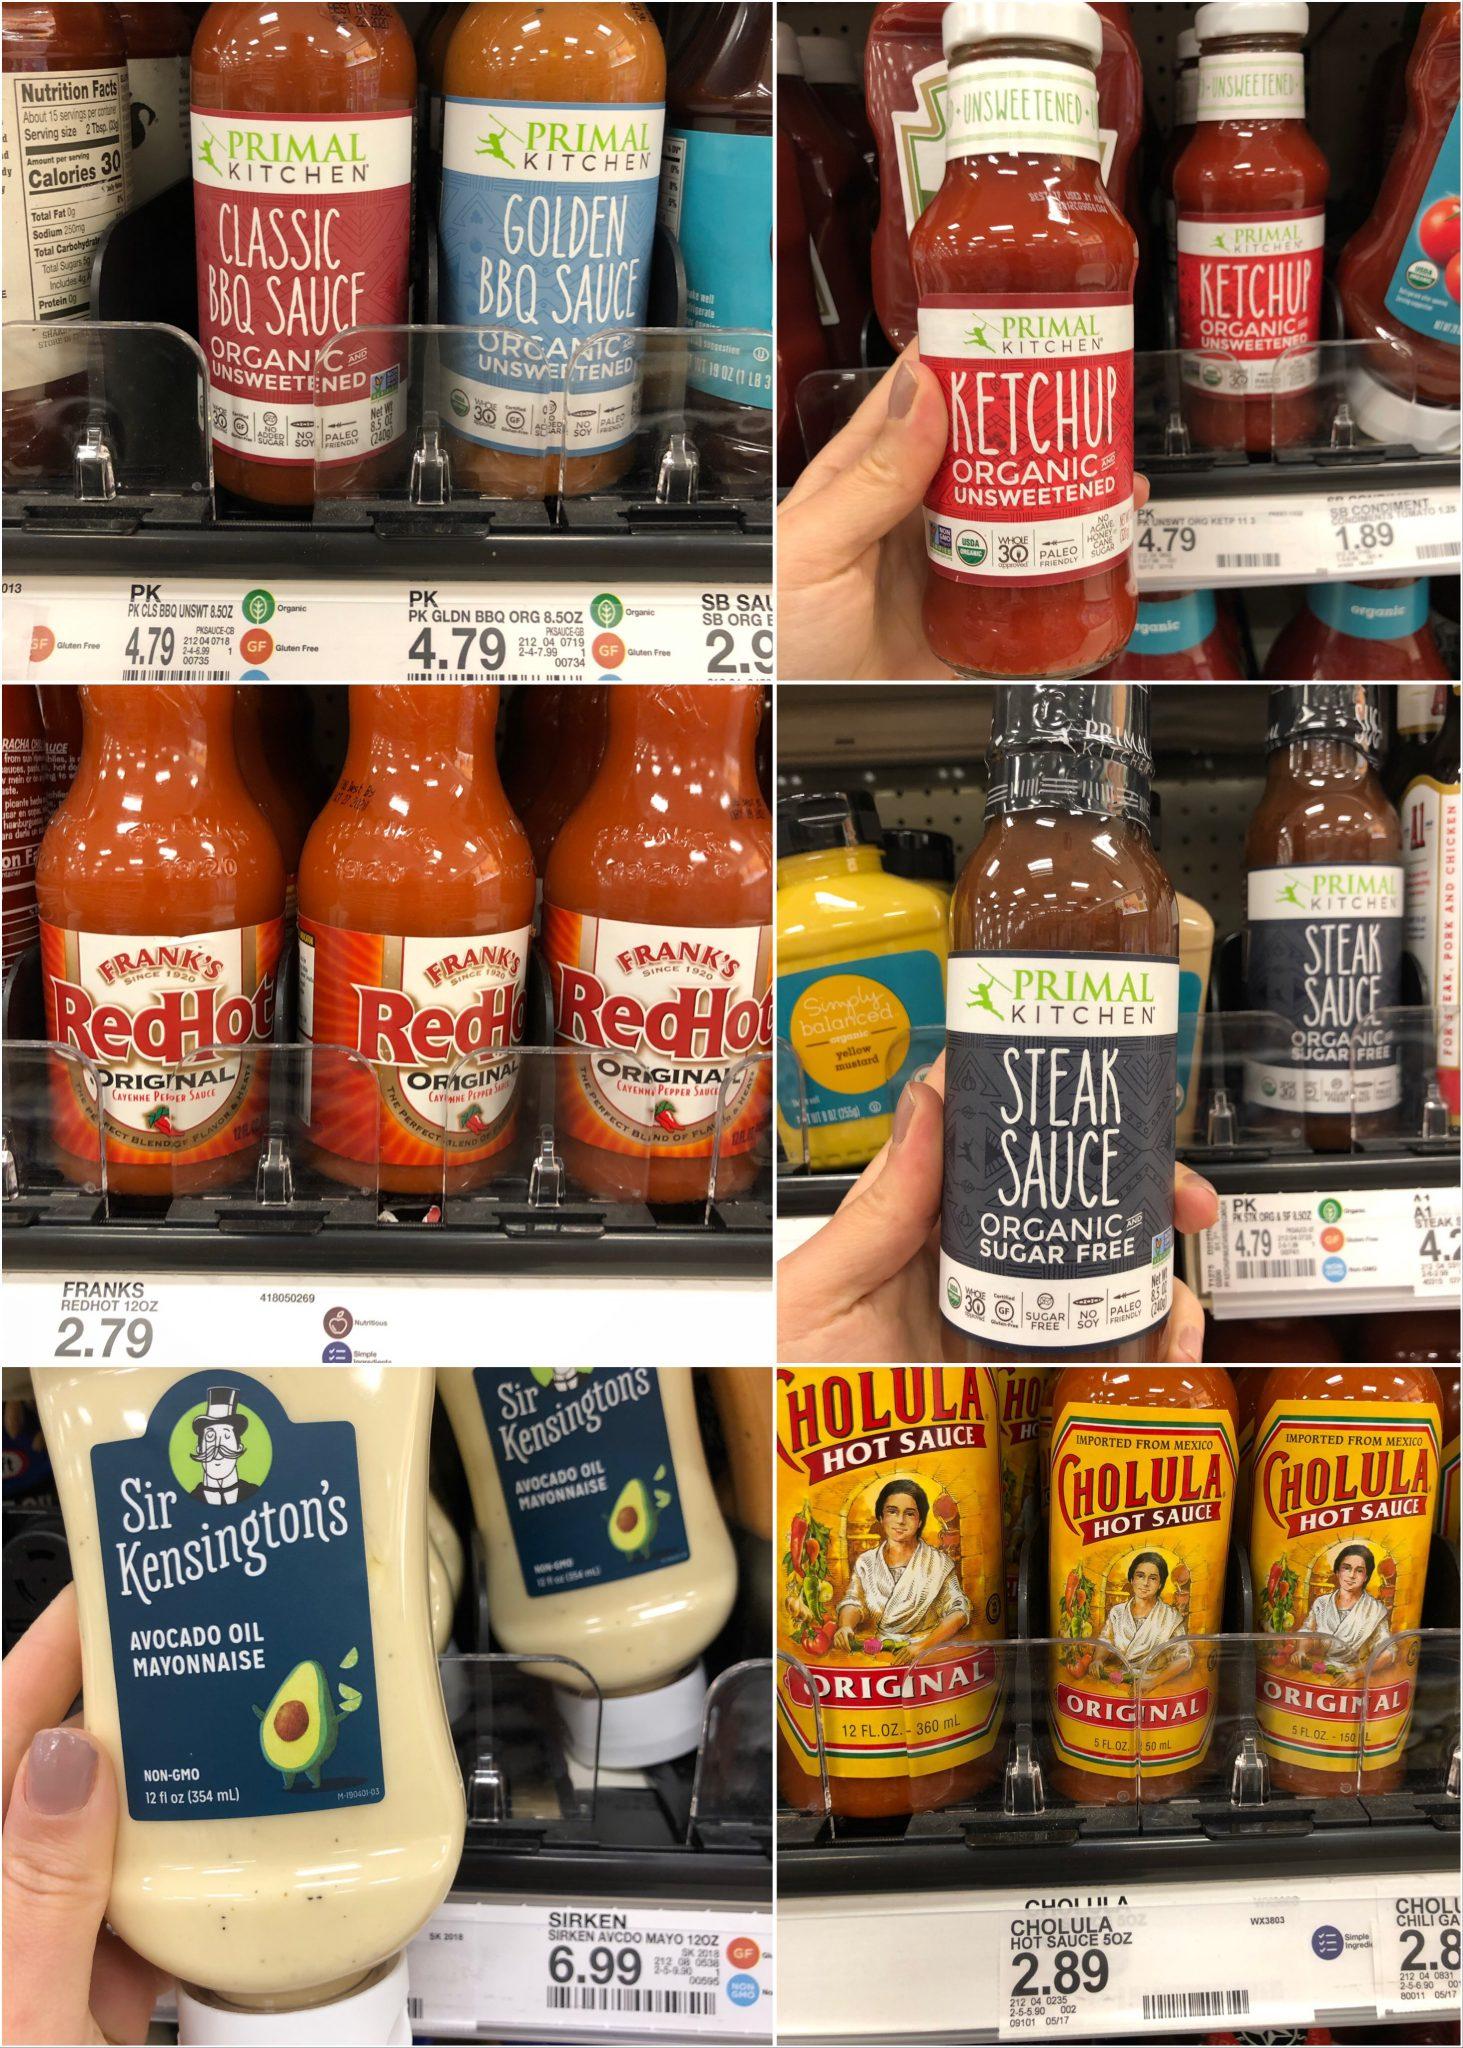 Whole30 ketchups and sauces at Target.